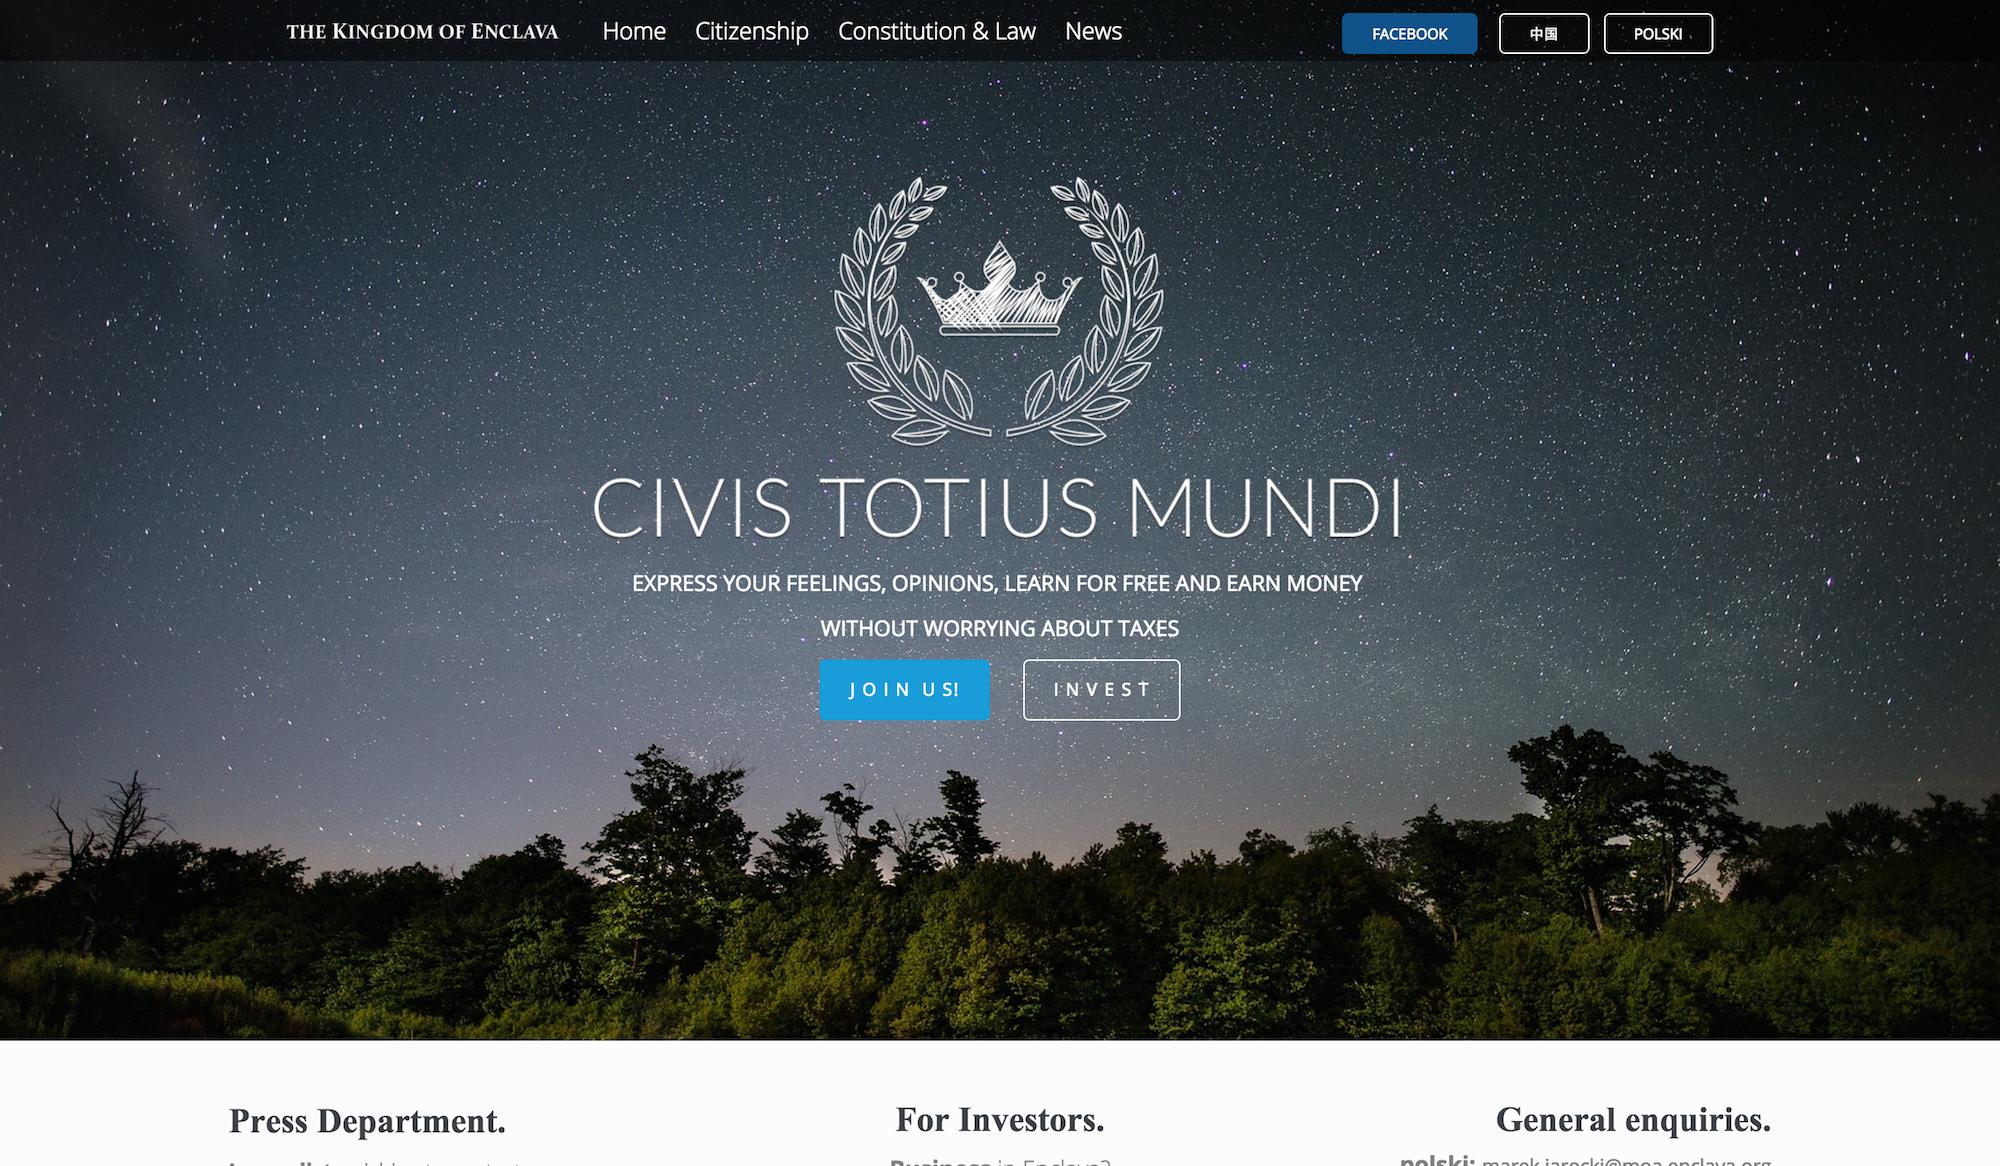 enclava.org   The Kingdom of Enclava – Official Website